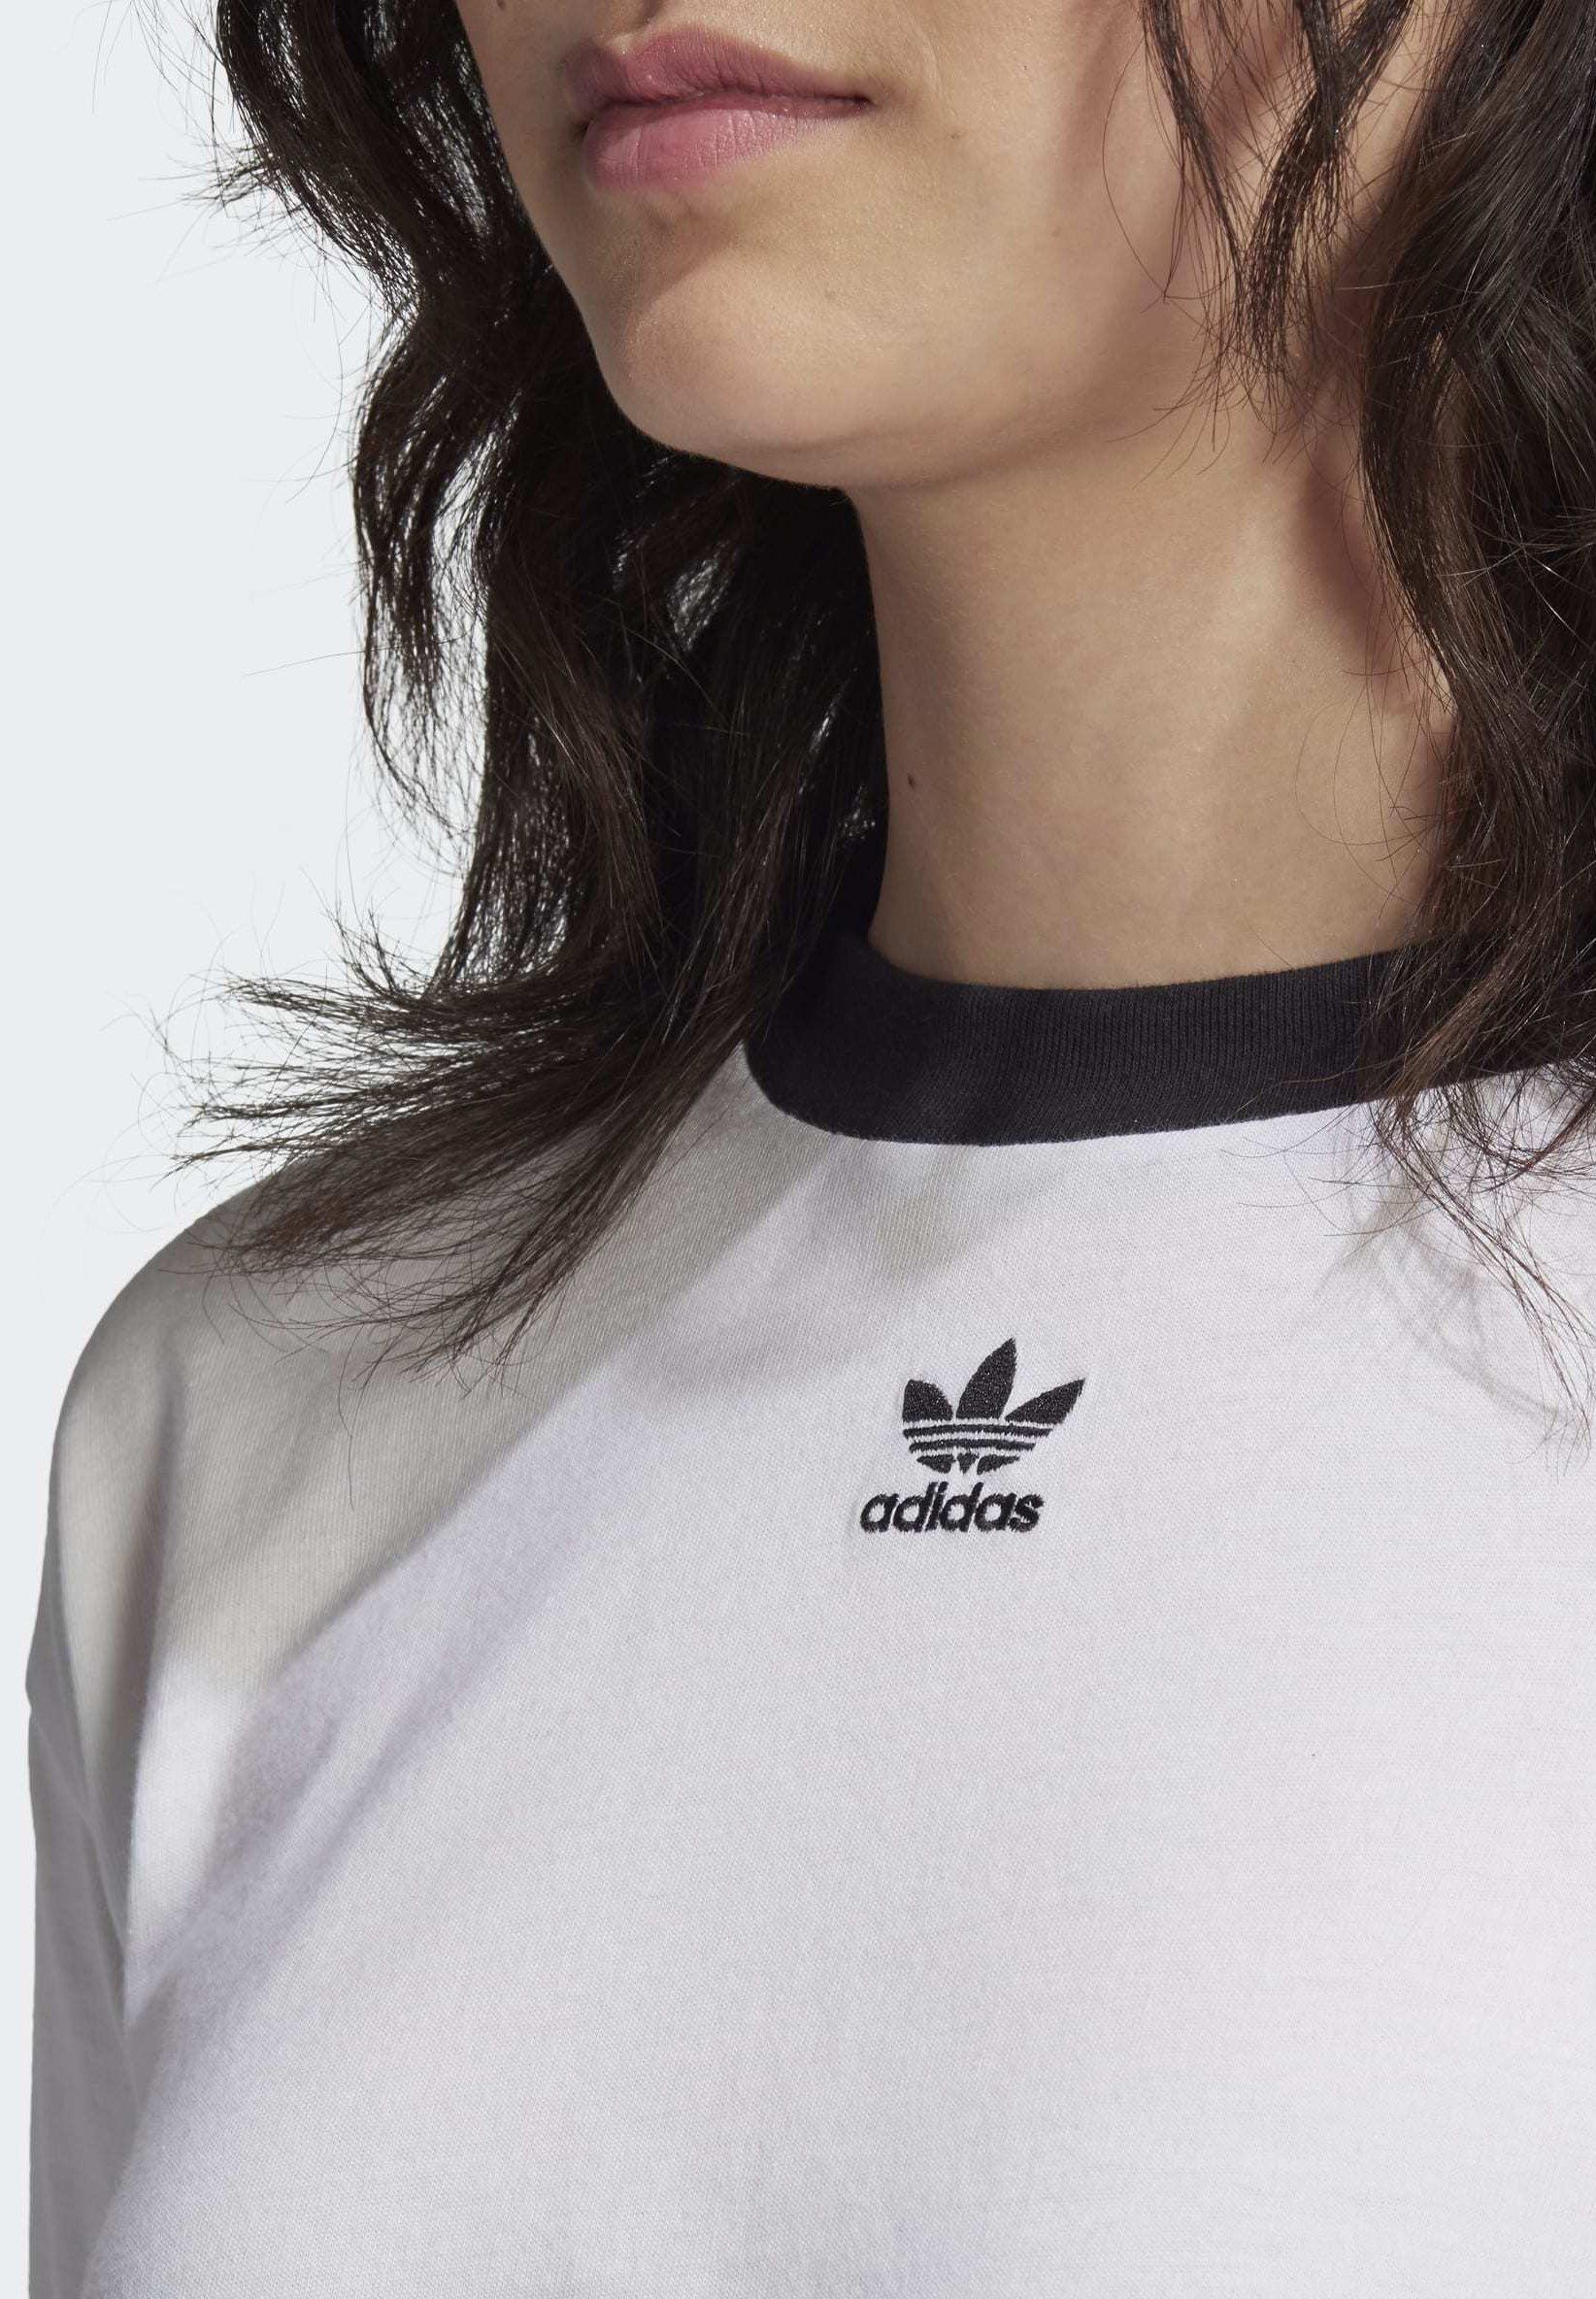 Adidas Women's Originals Crop Top ab 37,50